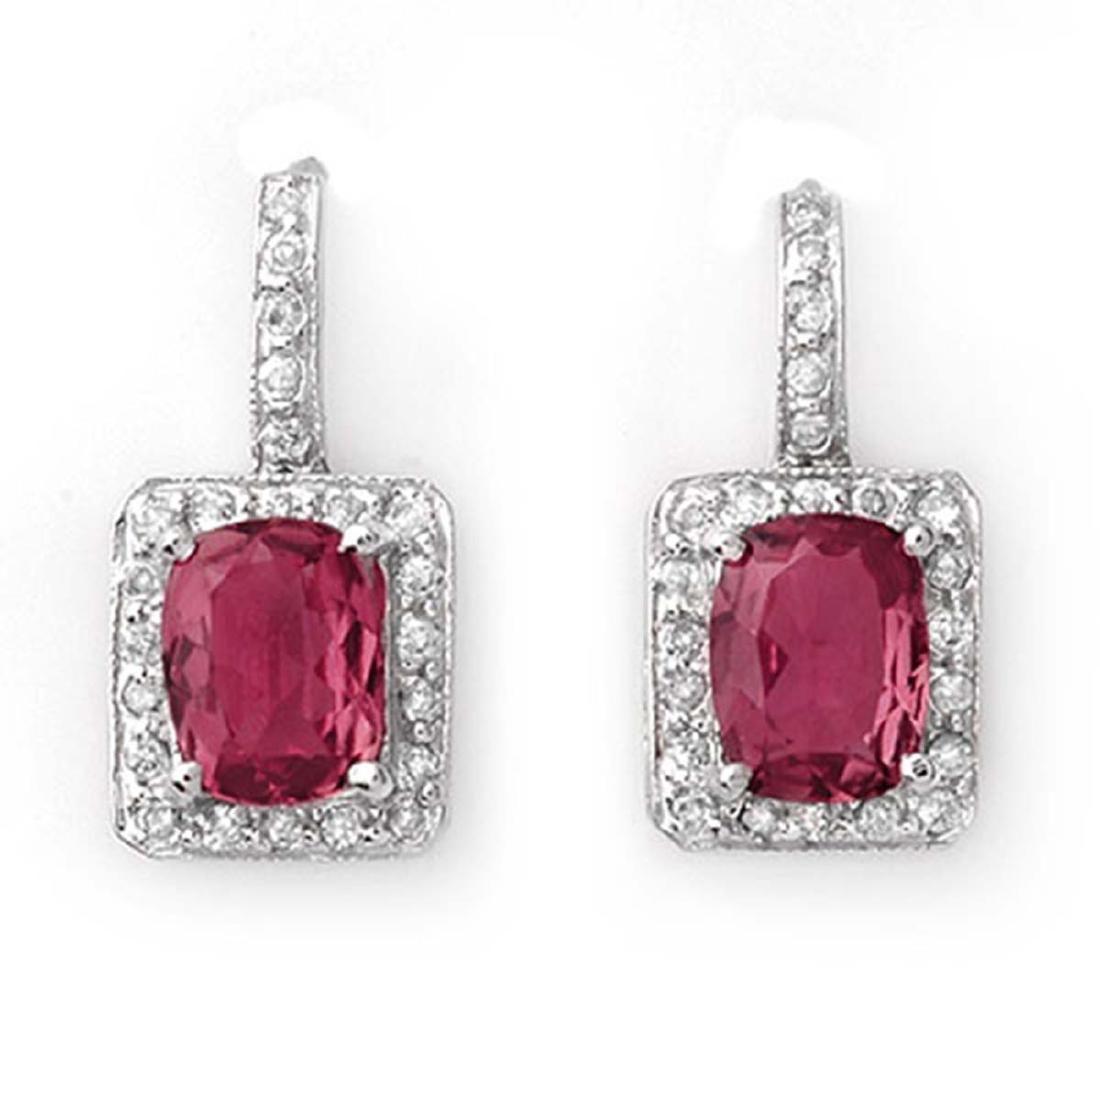 3.50 ctw Pink Tourmaline & Diamond Earrings 14K White